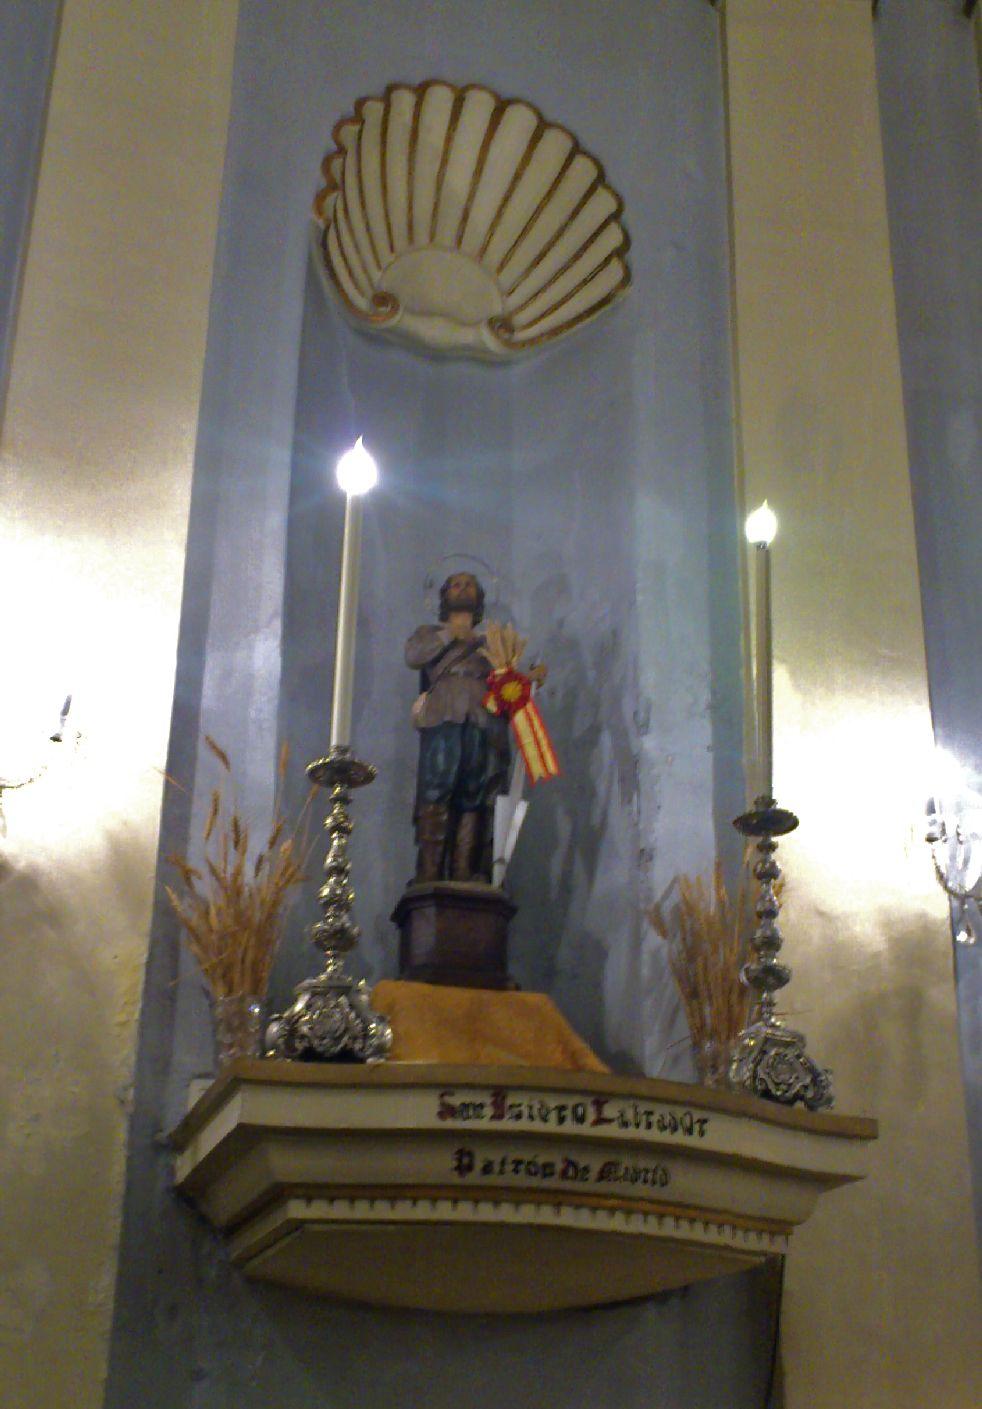 Talla de San Isidro. Colegiata de San Isidro. Calle Toledo, 37. Madrid